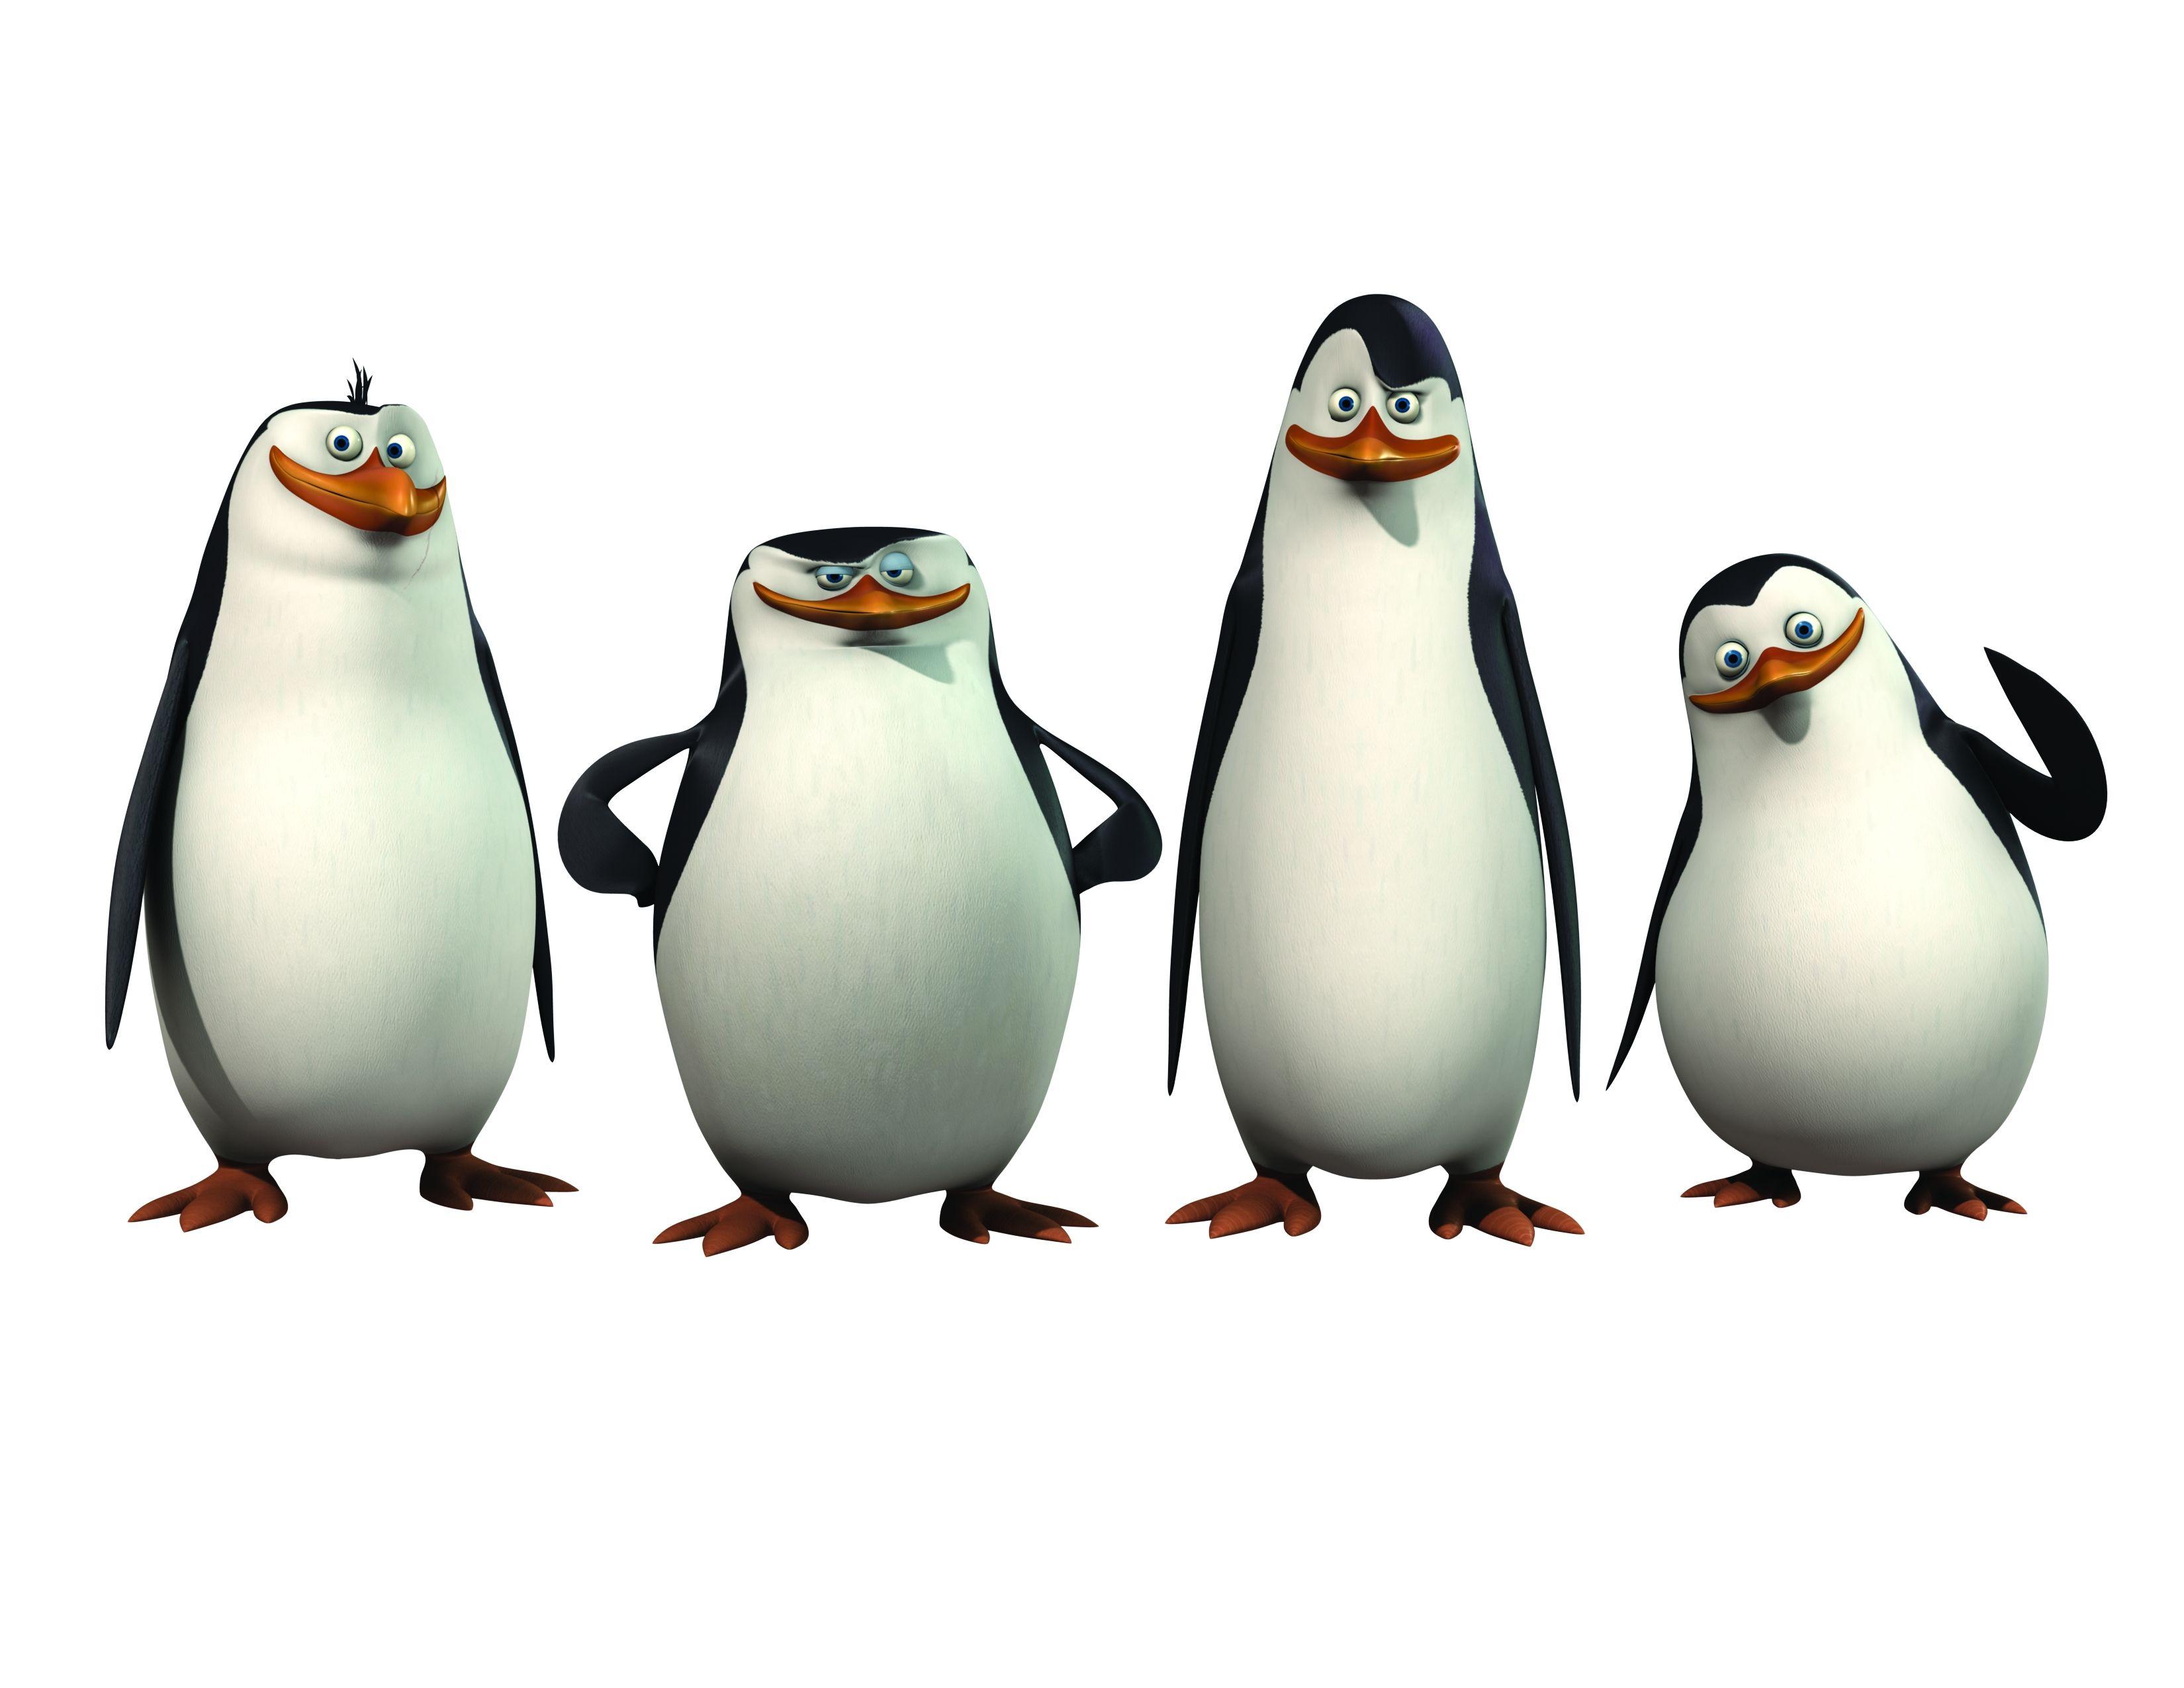 Pinguinos De Madagascar D Penguins Of Madagascar Penguins Penguin Pictures